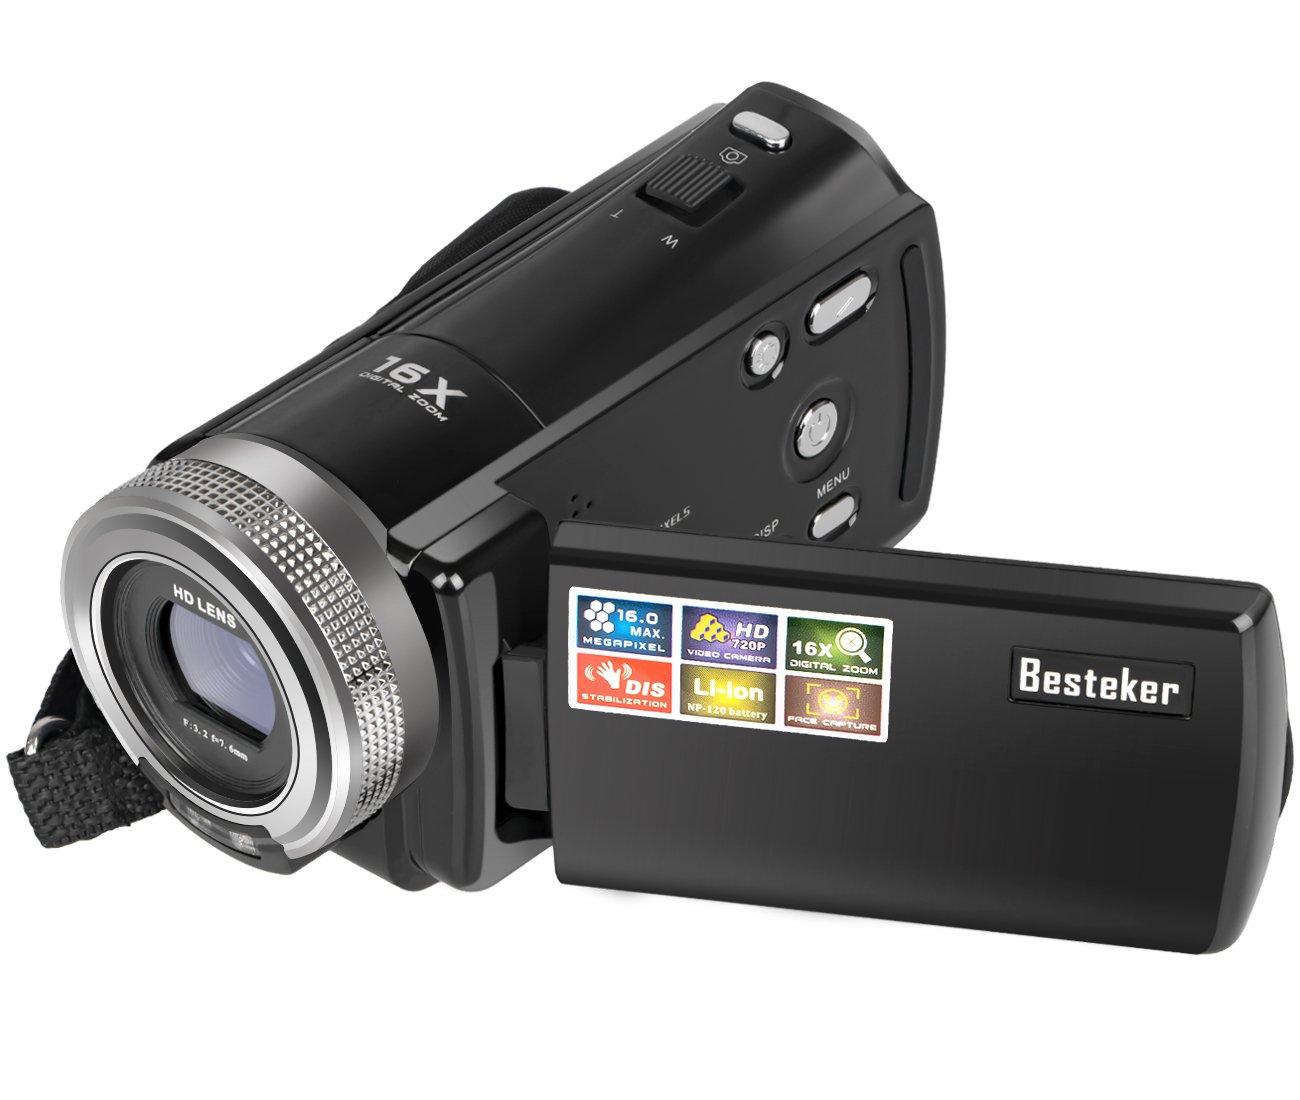 Top 10 Best Digital Camcorder (2020 Reviews & Buying Guide) 9